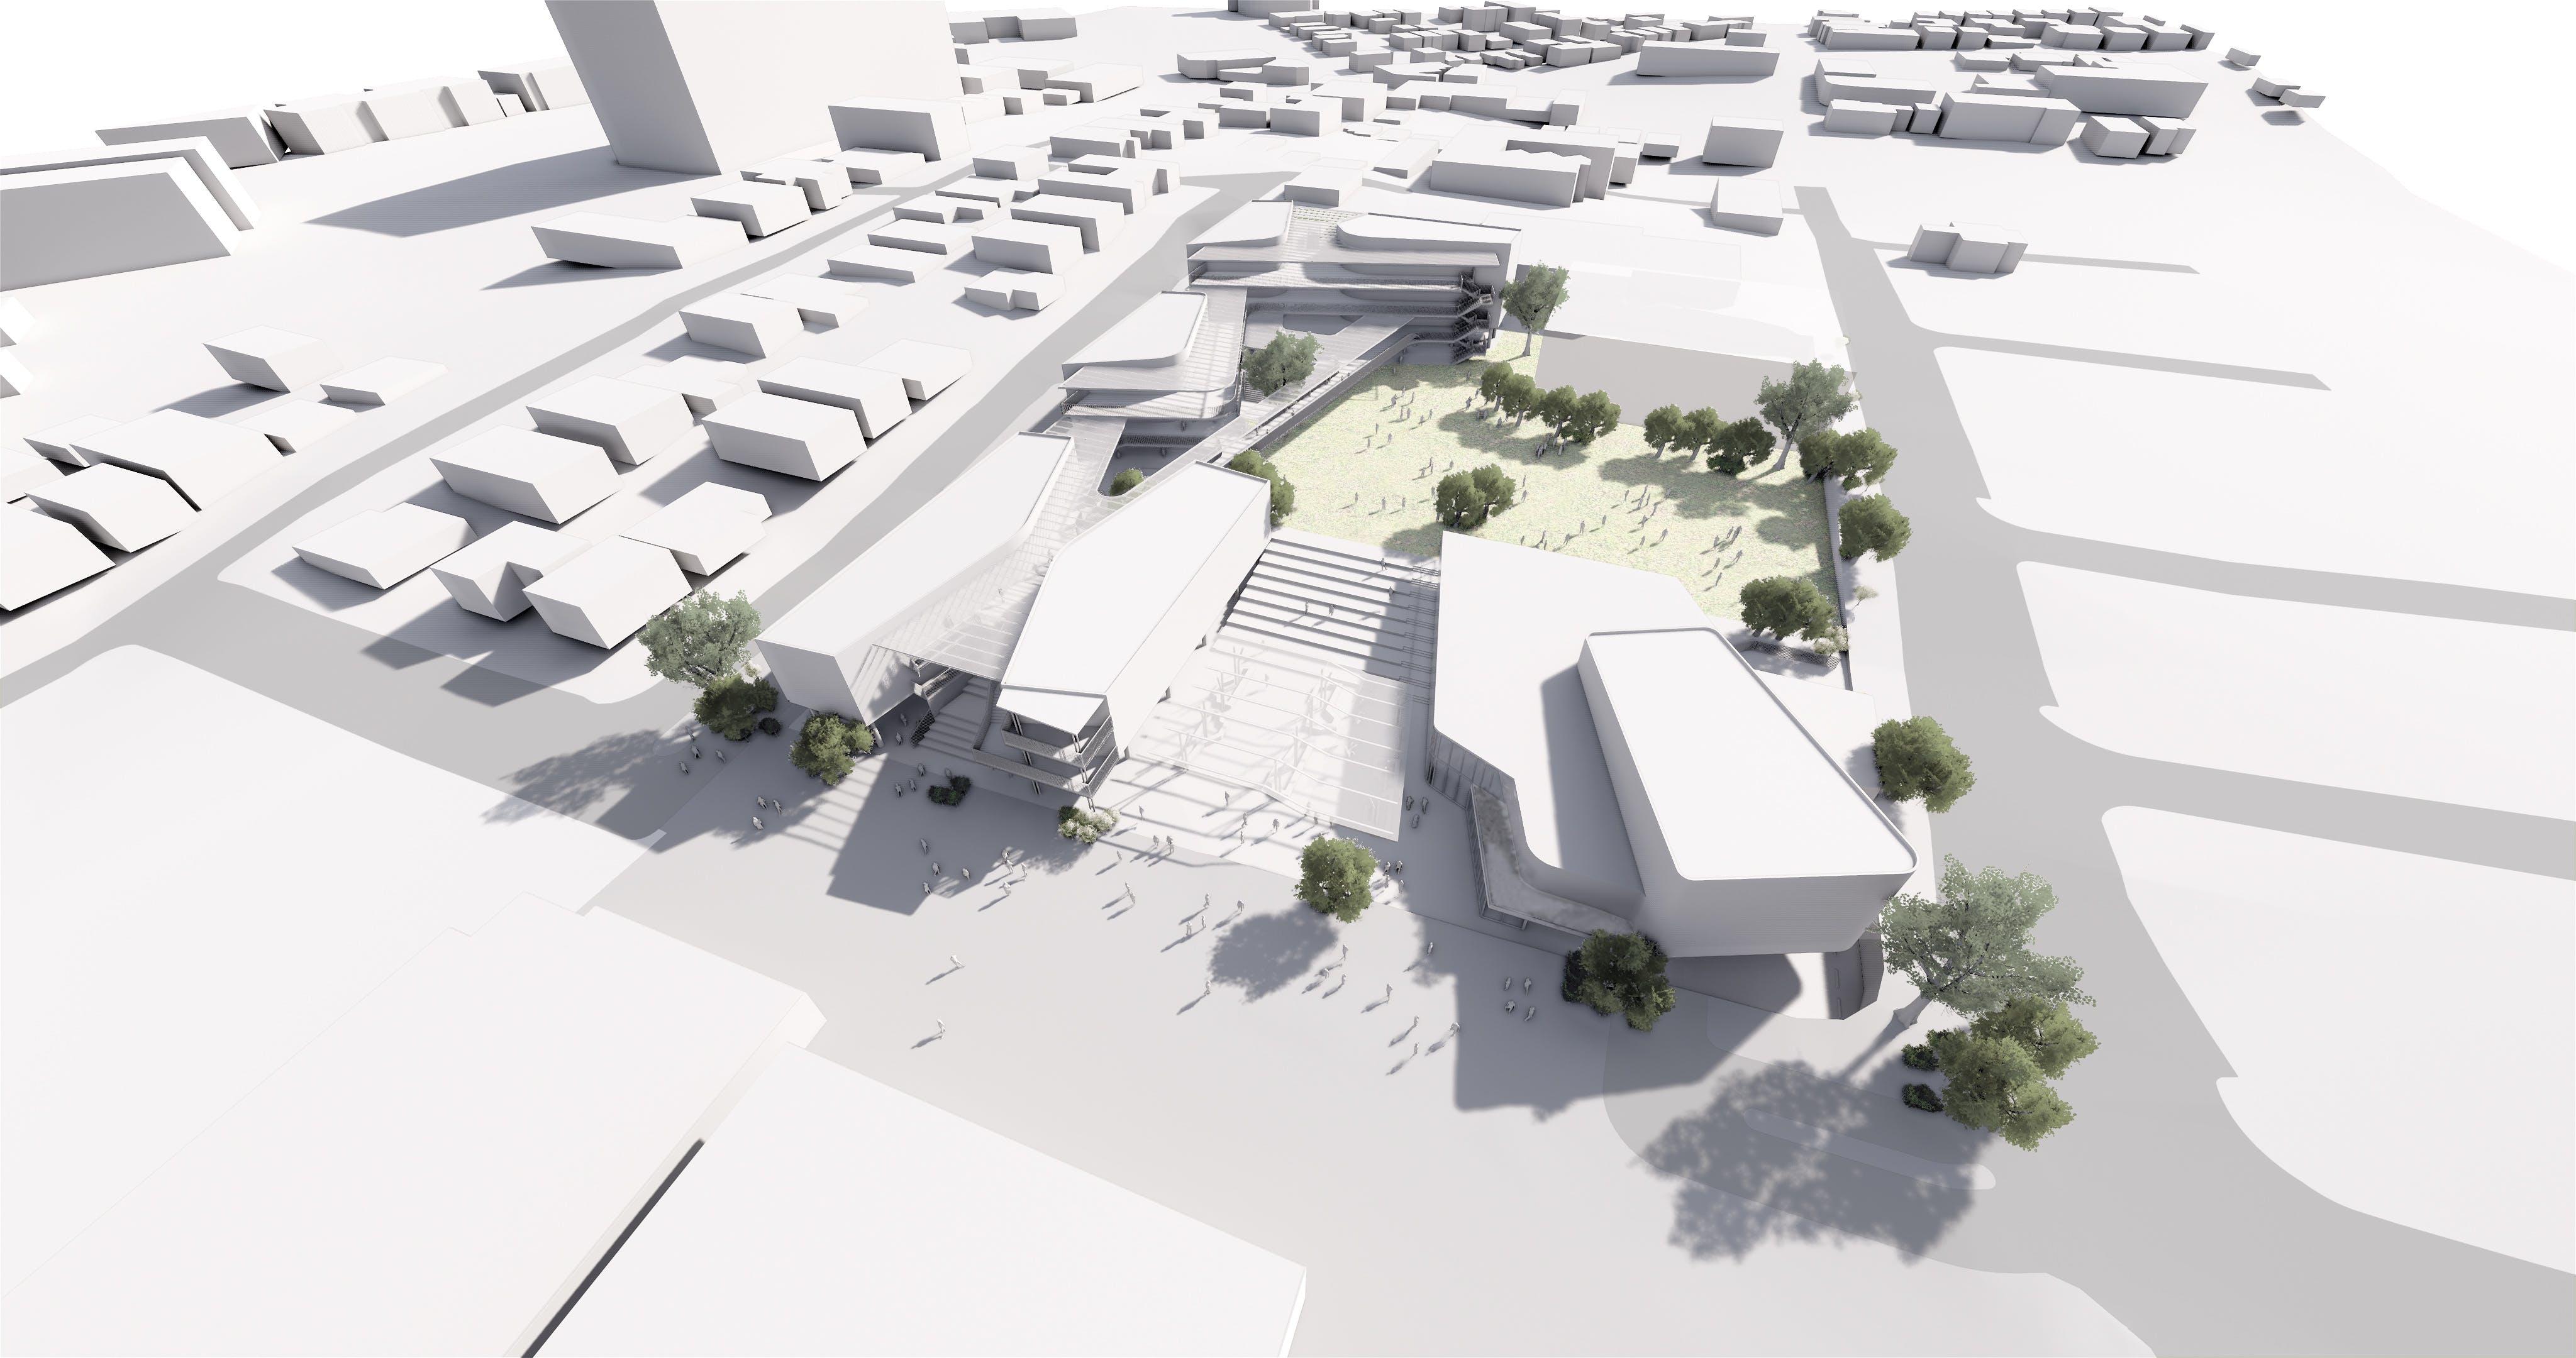 WESS expansion 3D masterplan